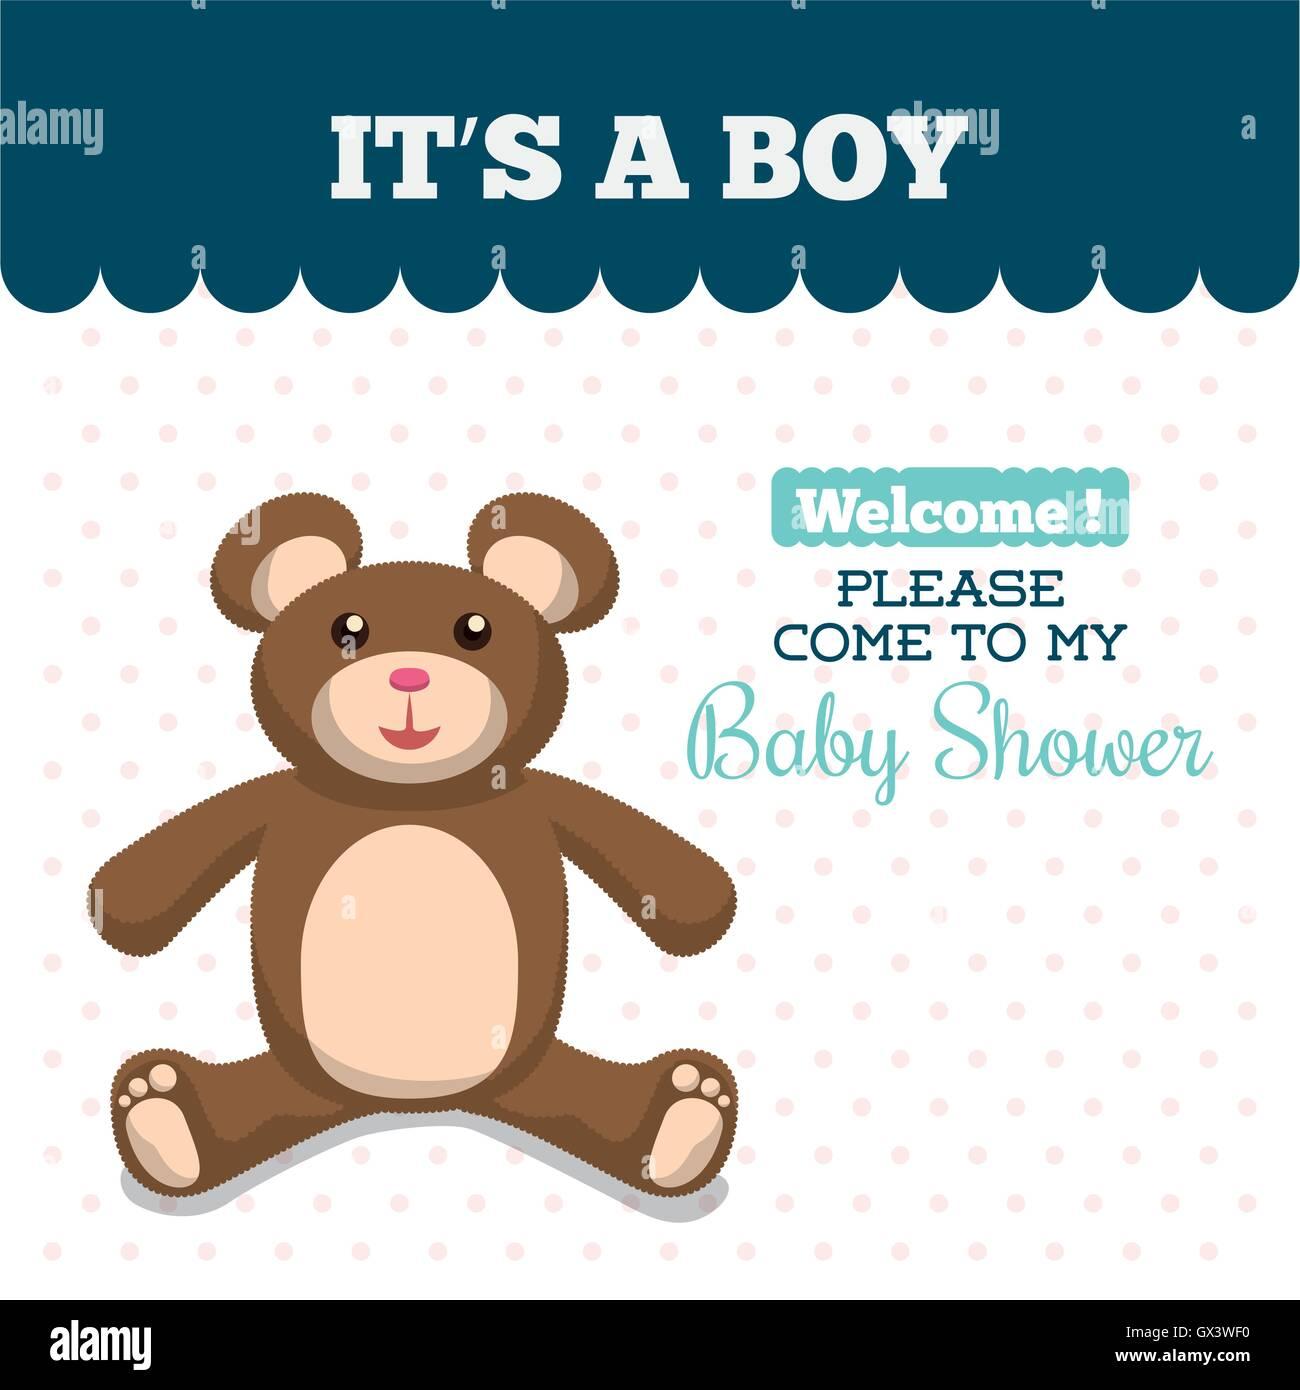 Baby Shower Invitation Card Design Stock Vector Art Illustration